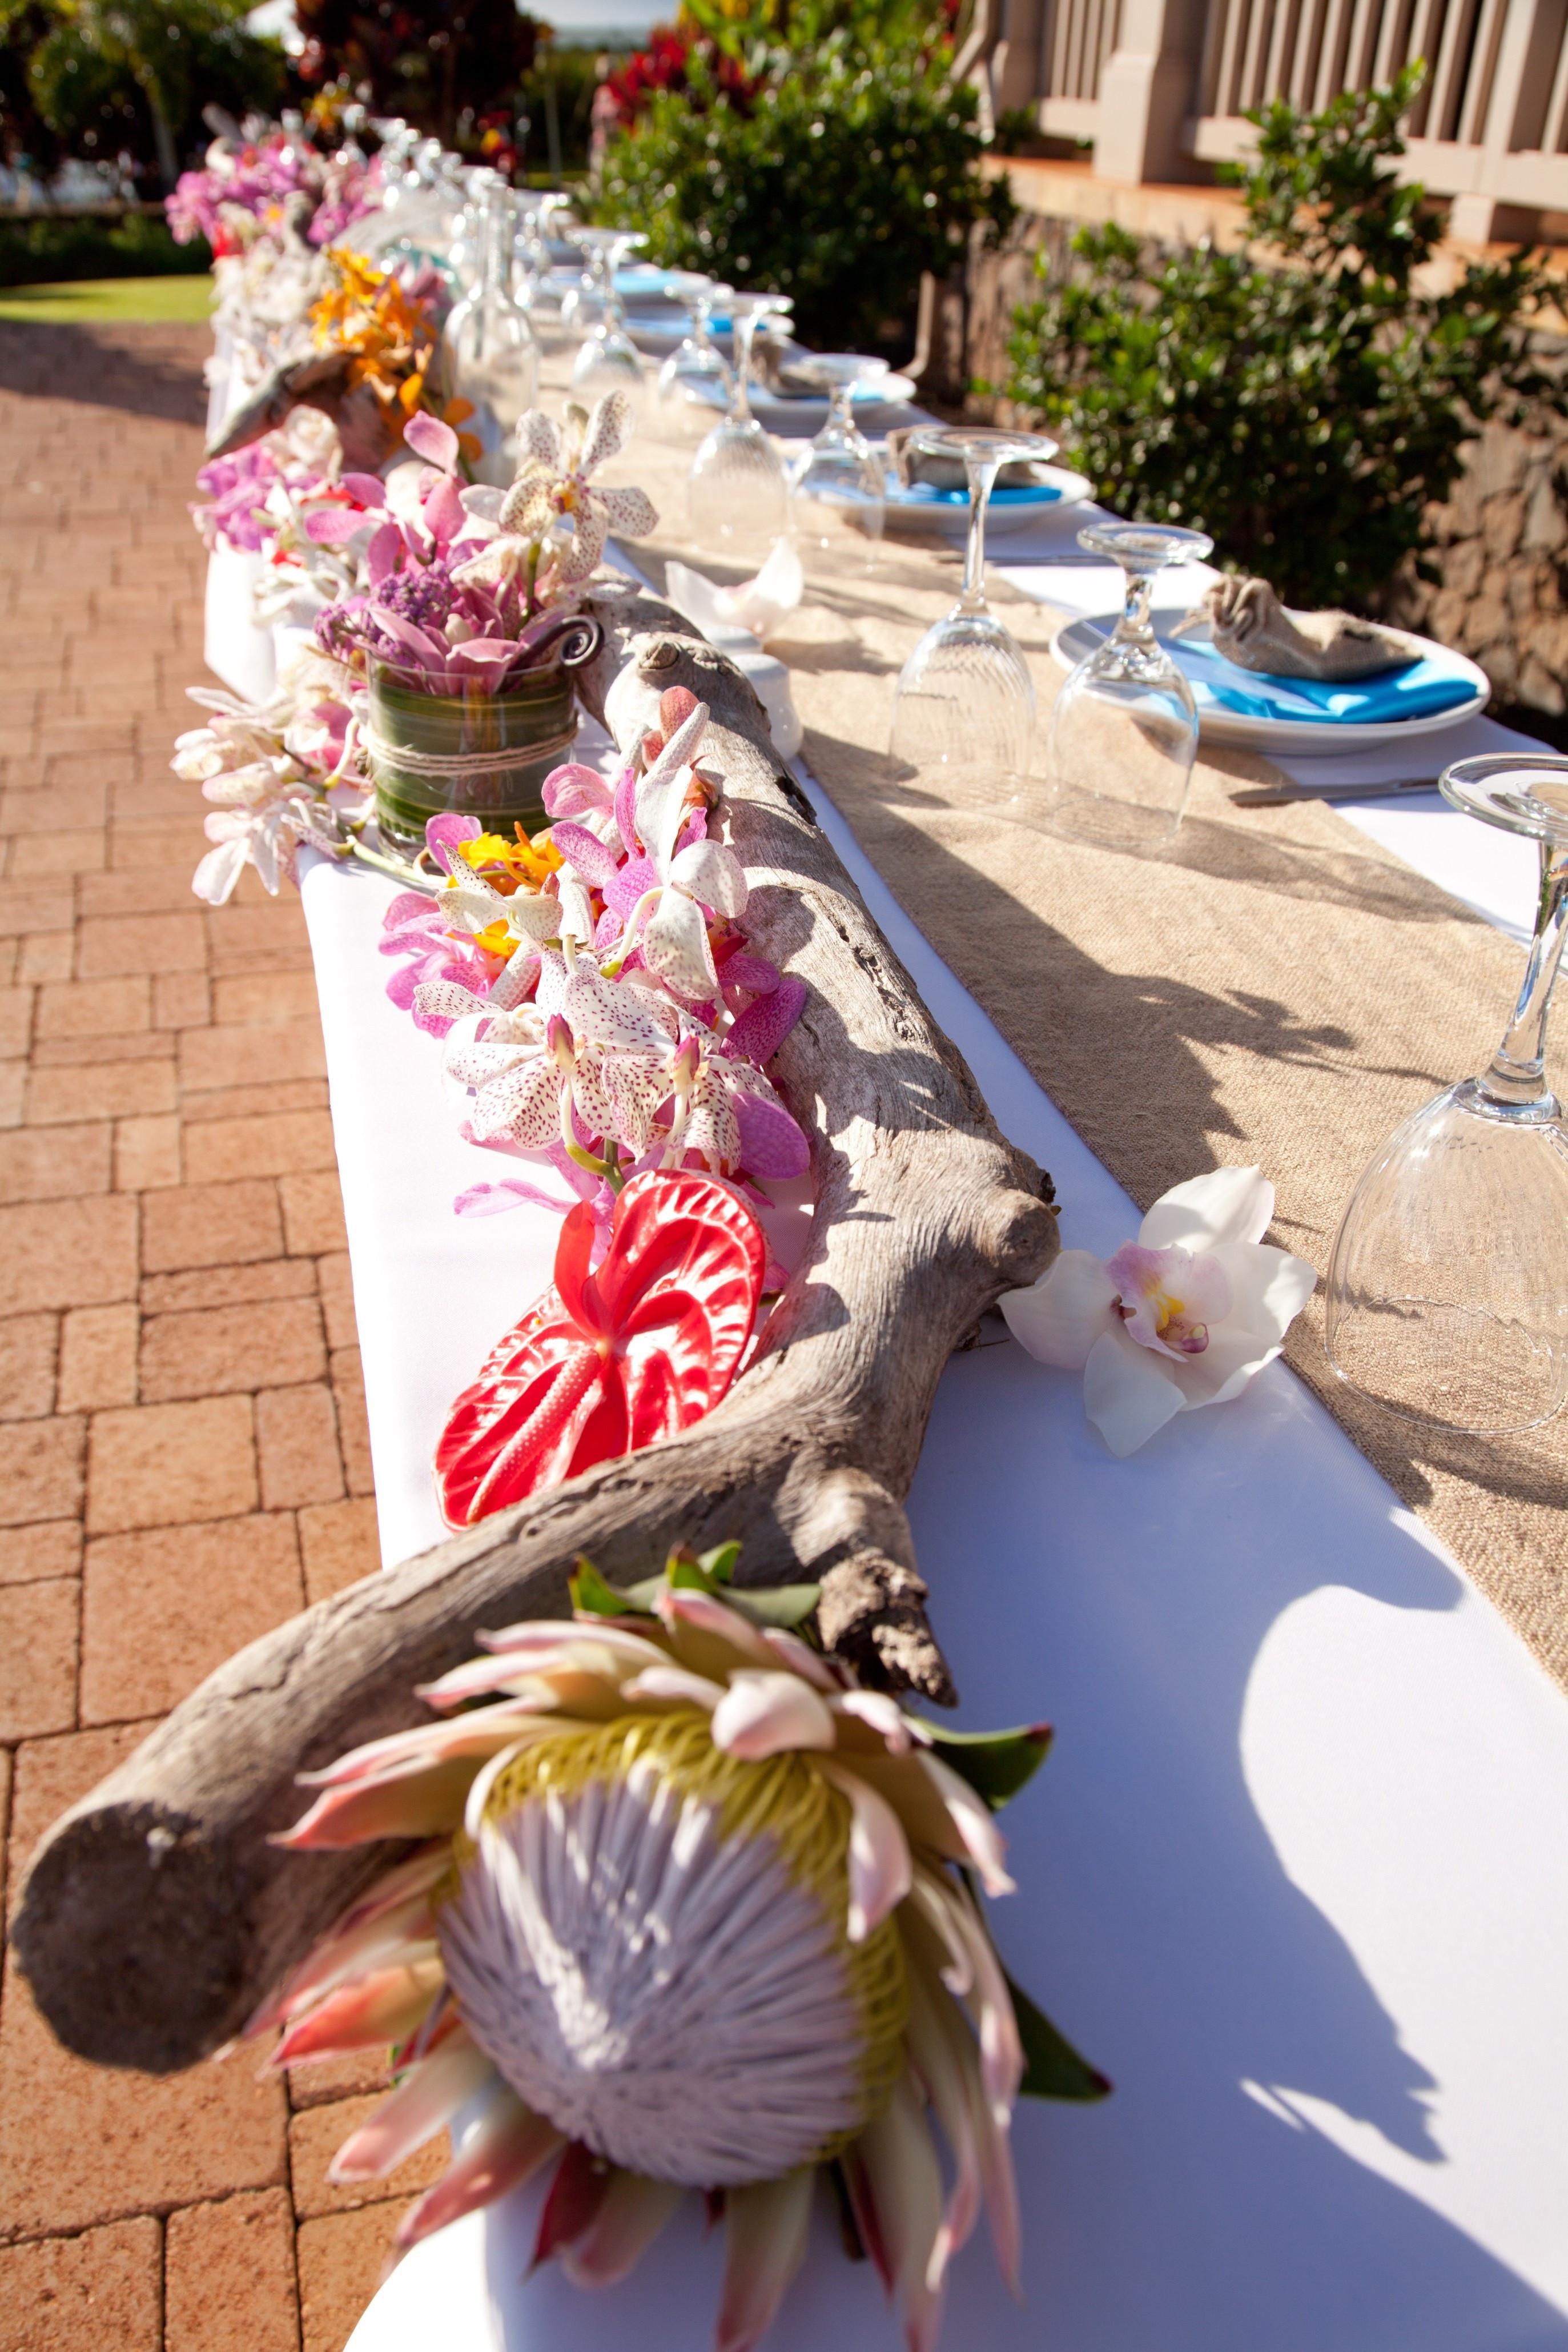 tall flower vases of 2 flower photos sophisticated tall vase centerpiece ideas vases in 2 flower photos fresh tropical wedding decor lovely media cache ec0 pinimg originals aa 0d 2 flower photos sophisticated tall vase centerpiece